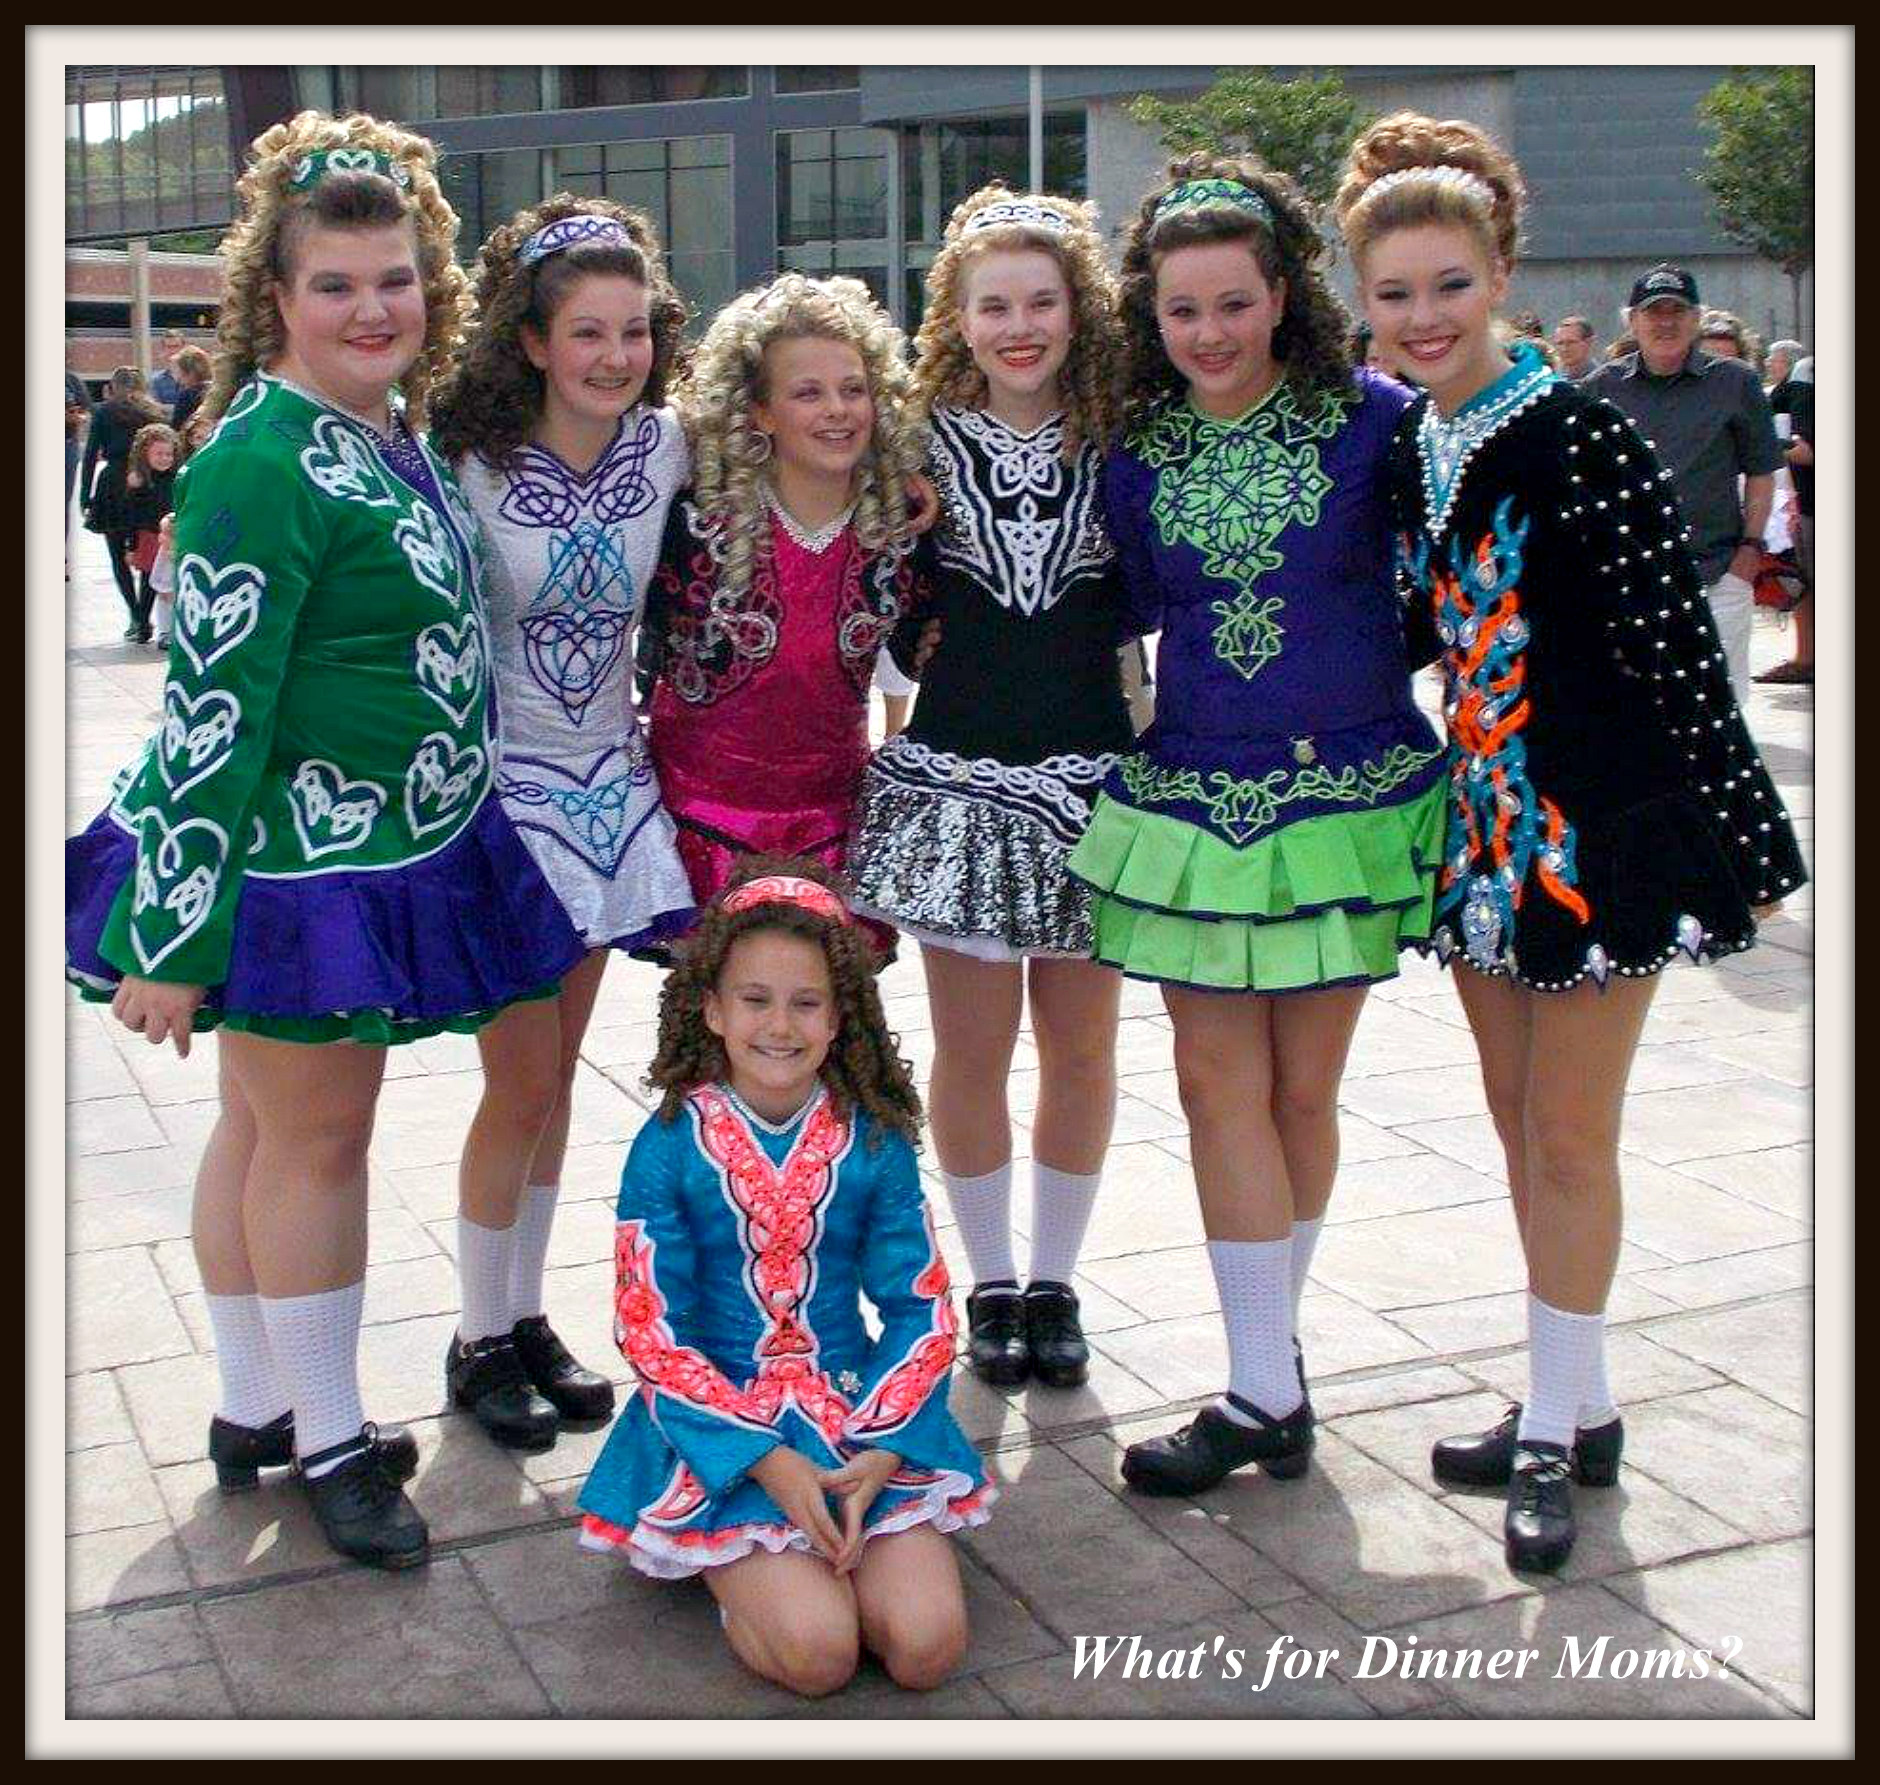 Free Irish Dance Classes In Lexington: What's For Dinner Moms?